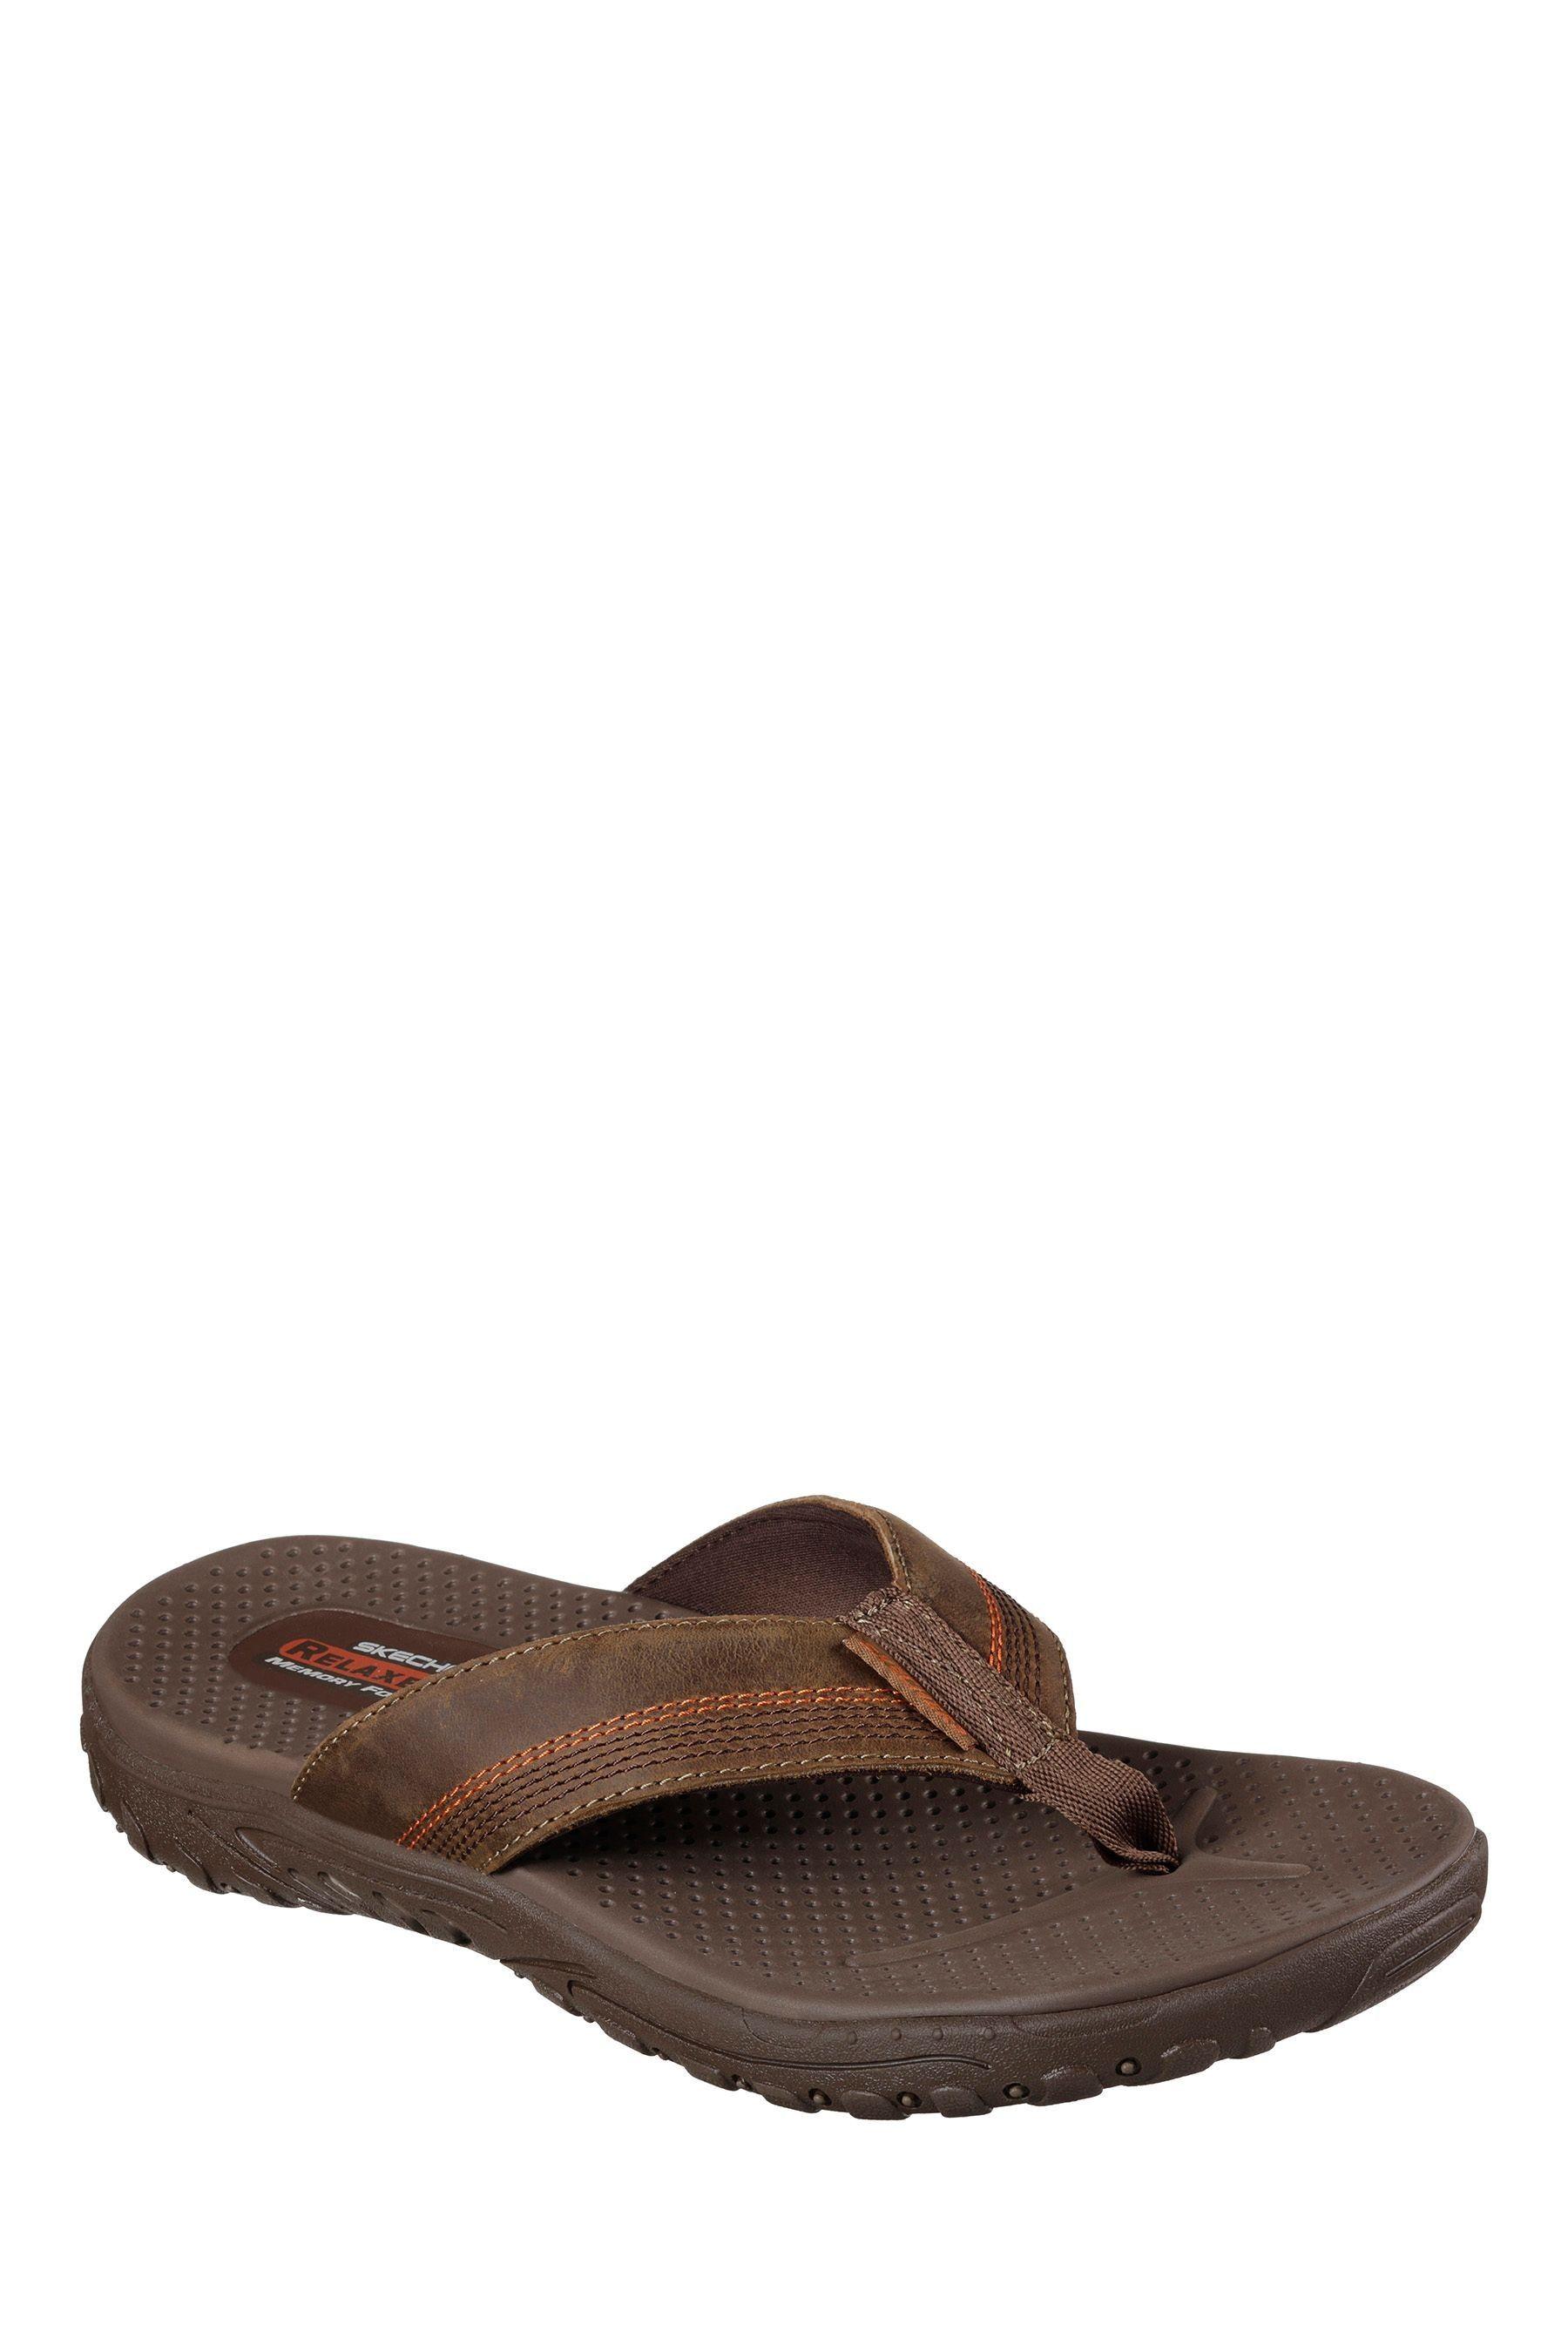 Mens Skechers Reggae Cobano Sandal